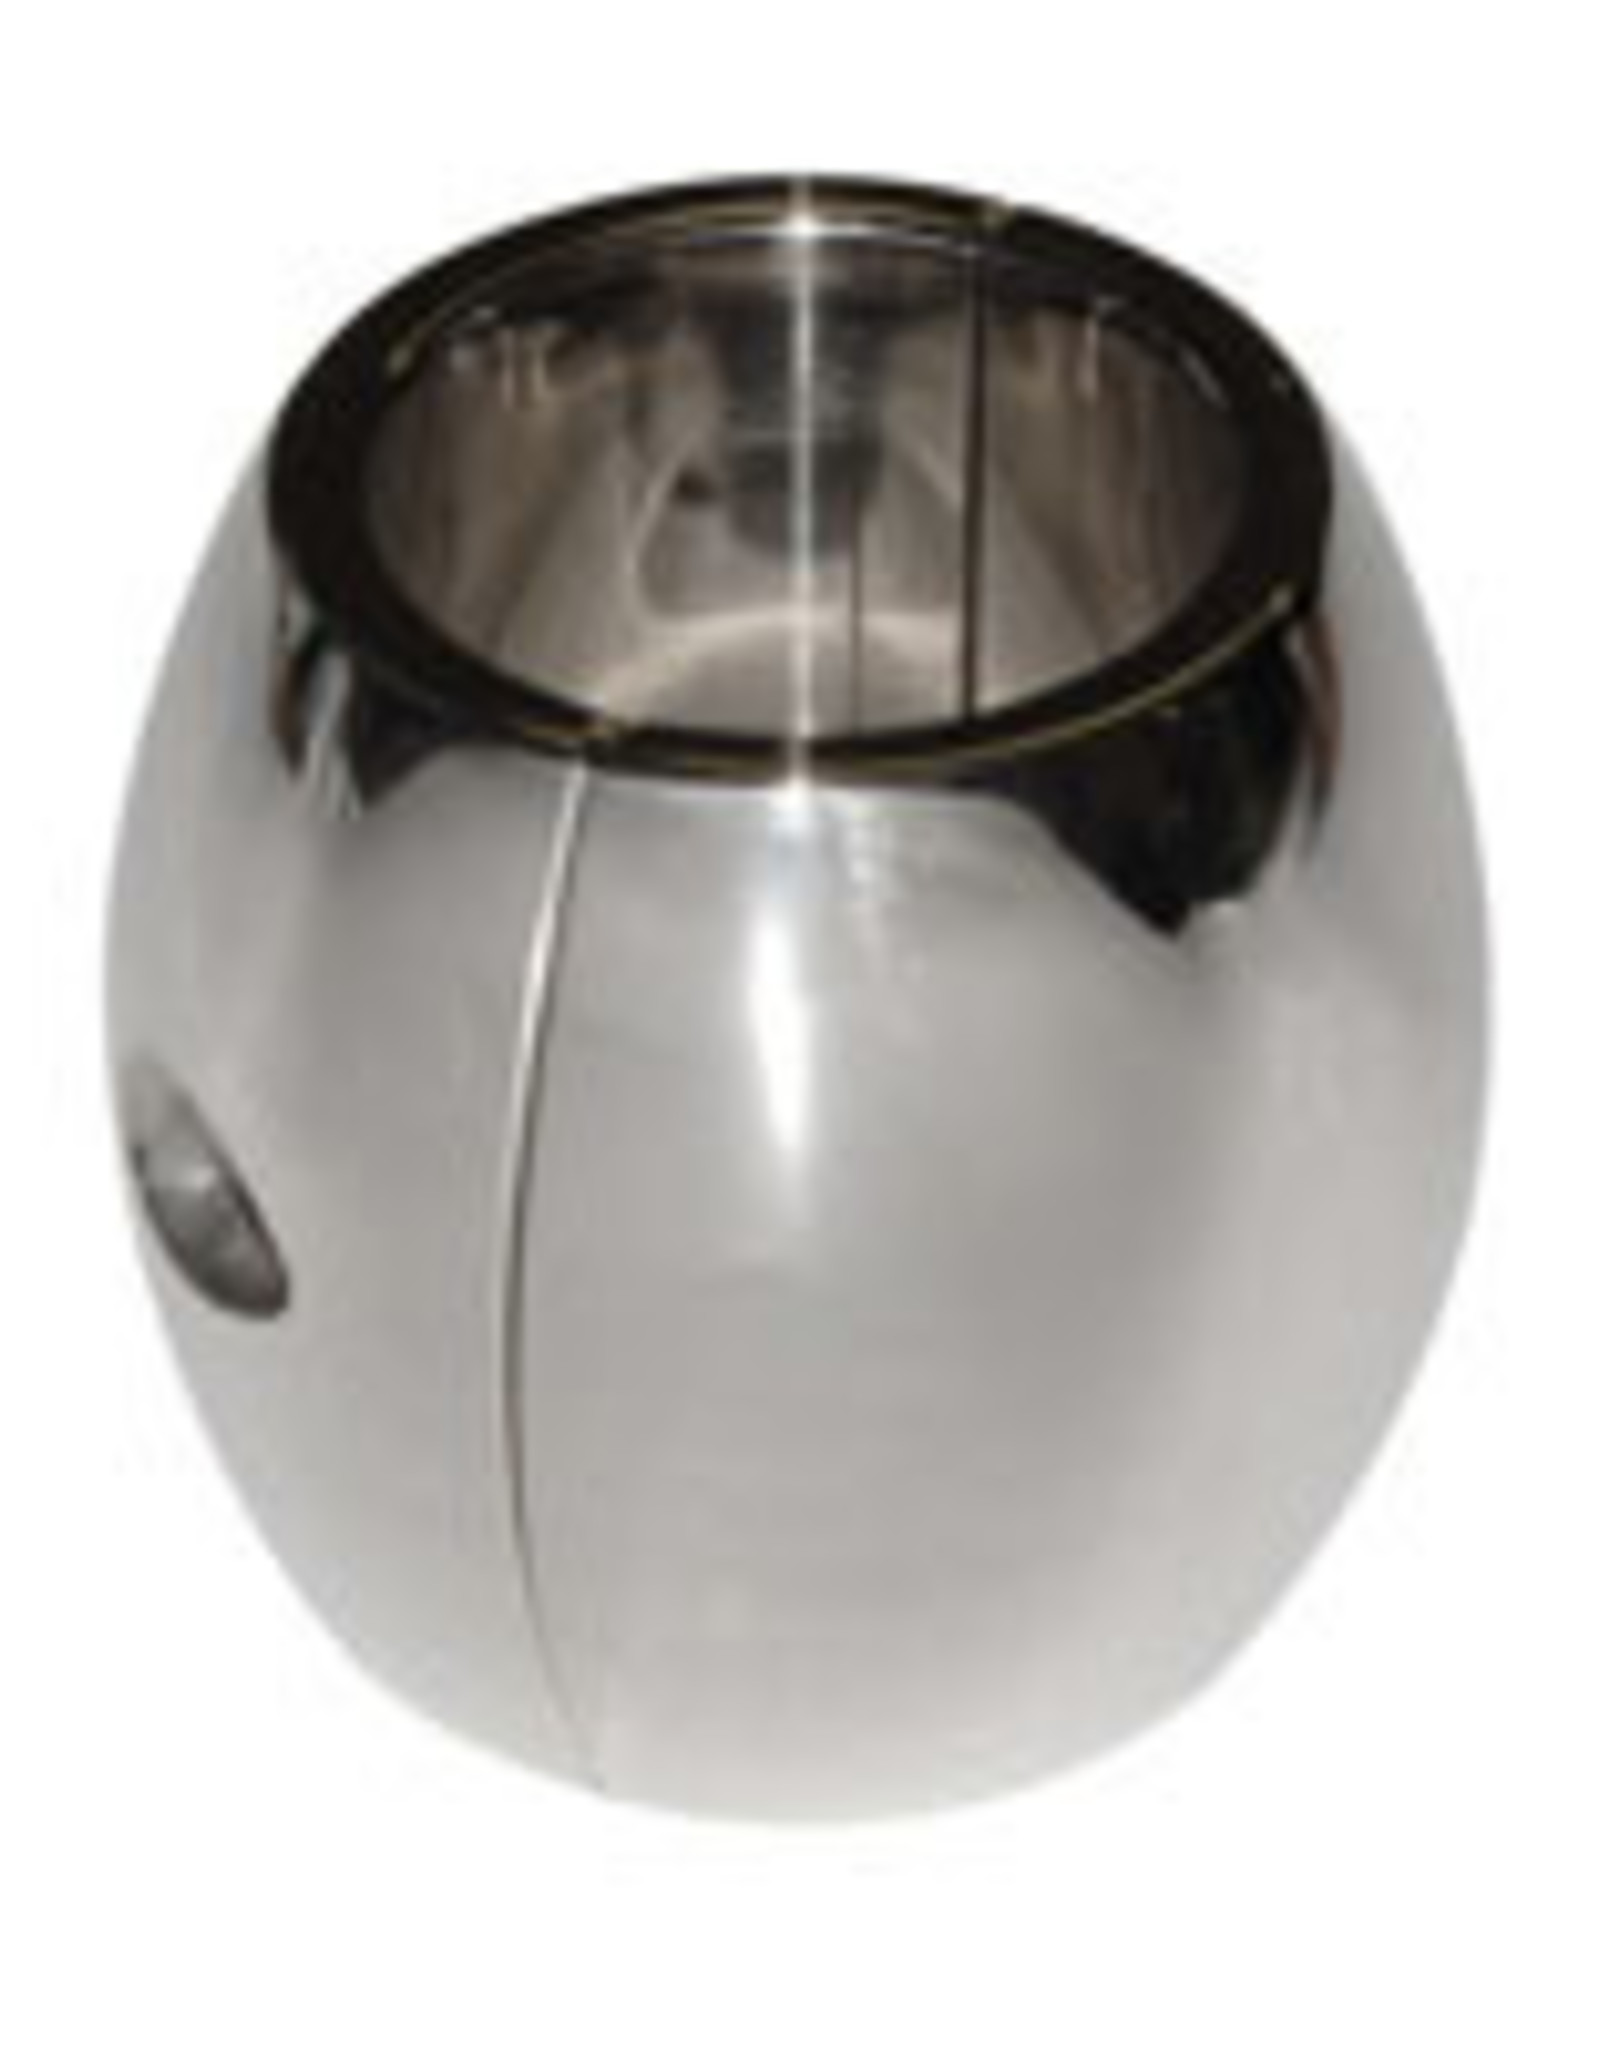 Edelstahl Ball Stretcher oval - 55 x 35mm